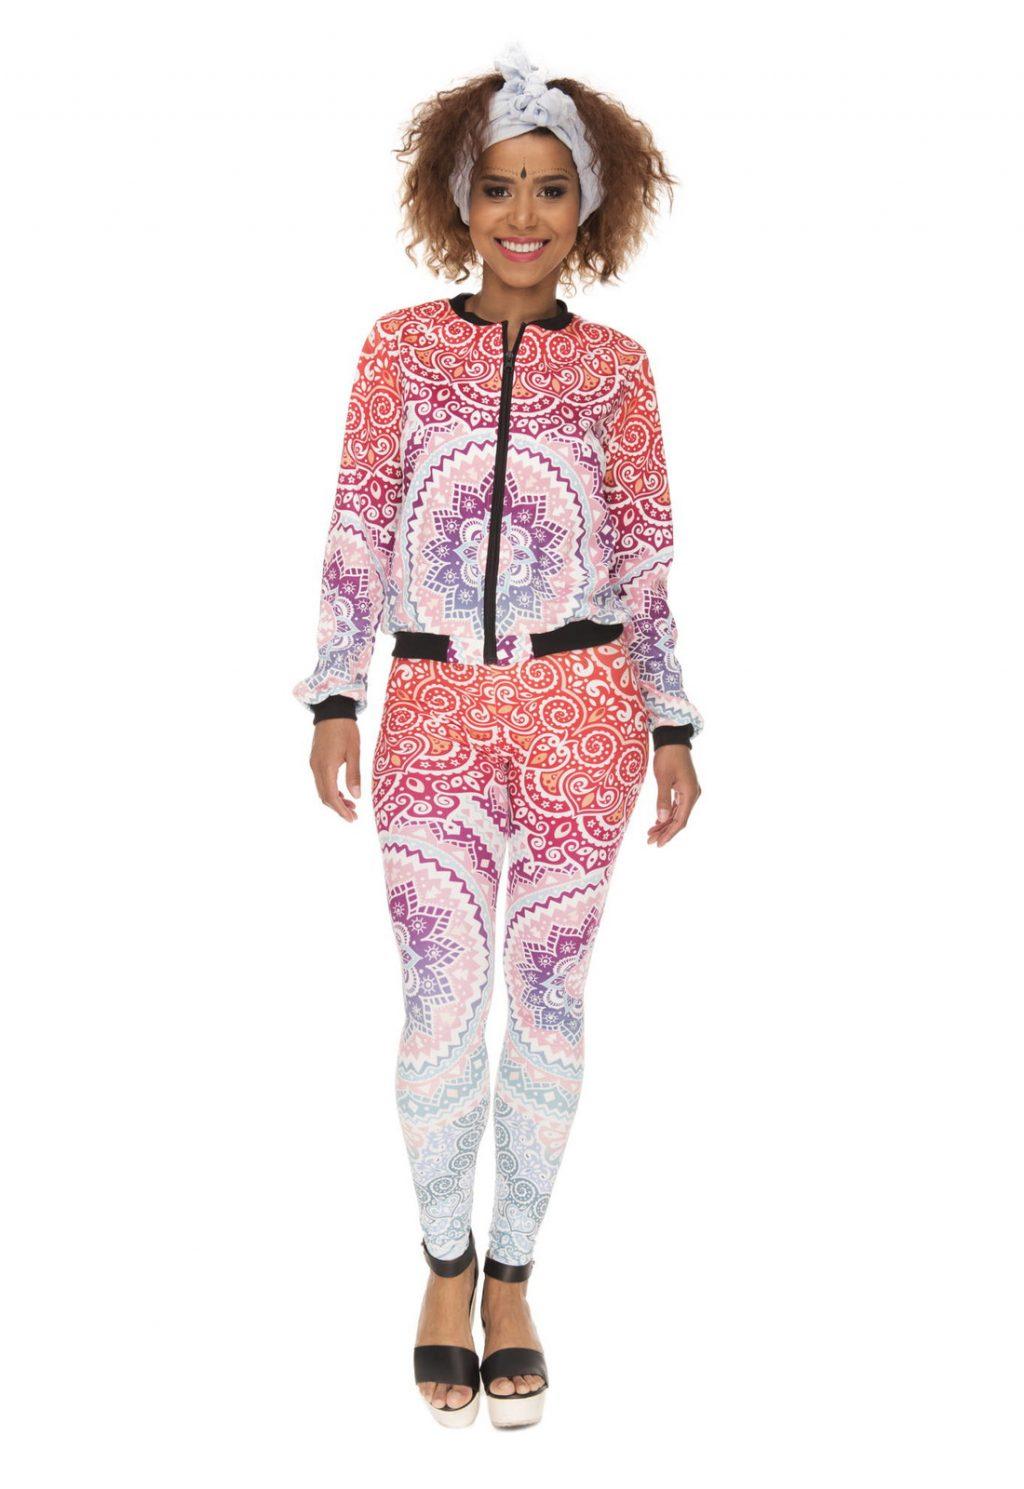 fullprint-leggings-ombre-aufdruck_6